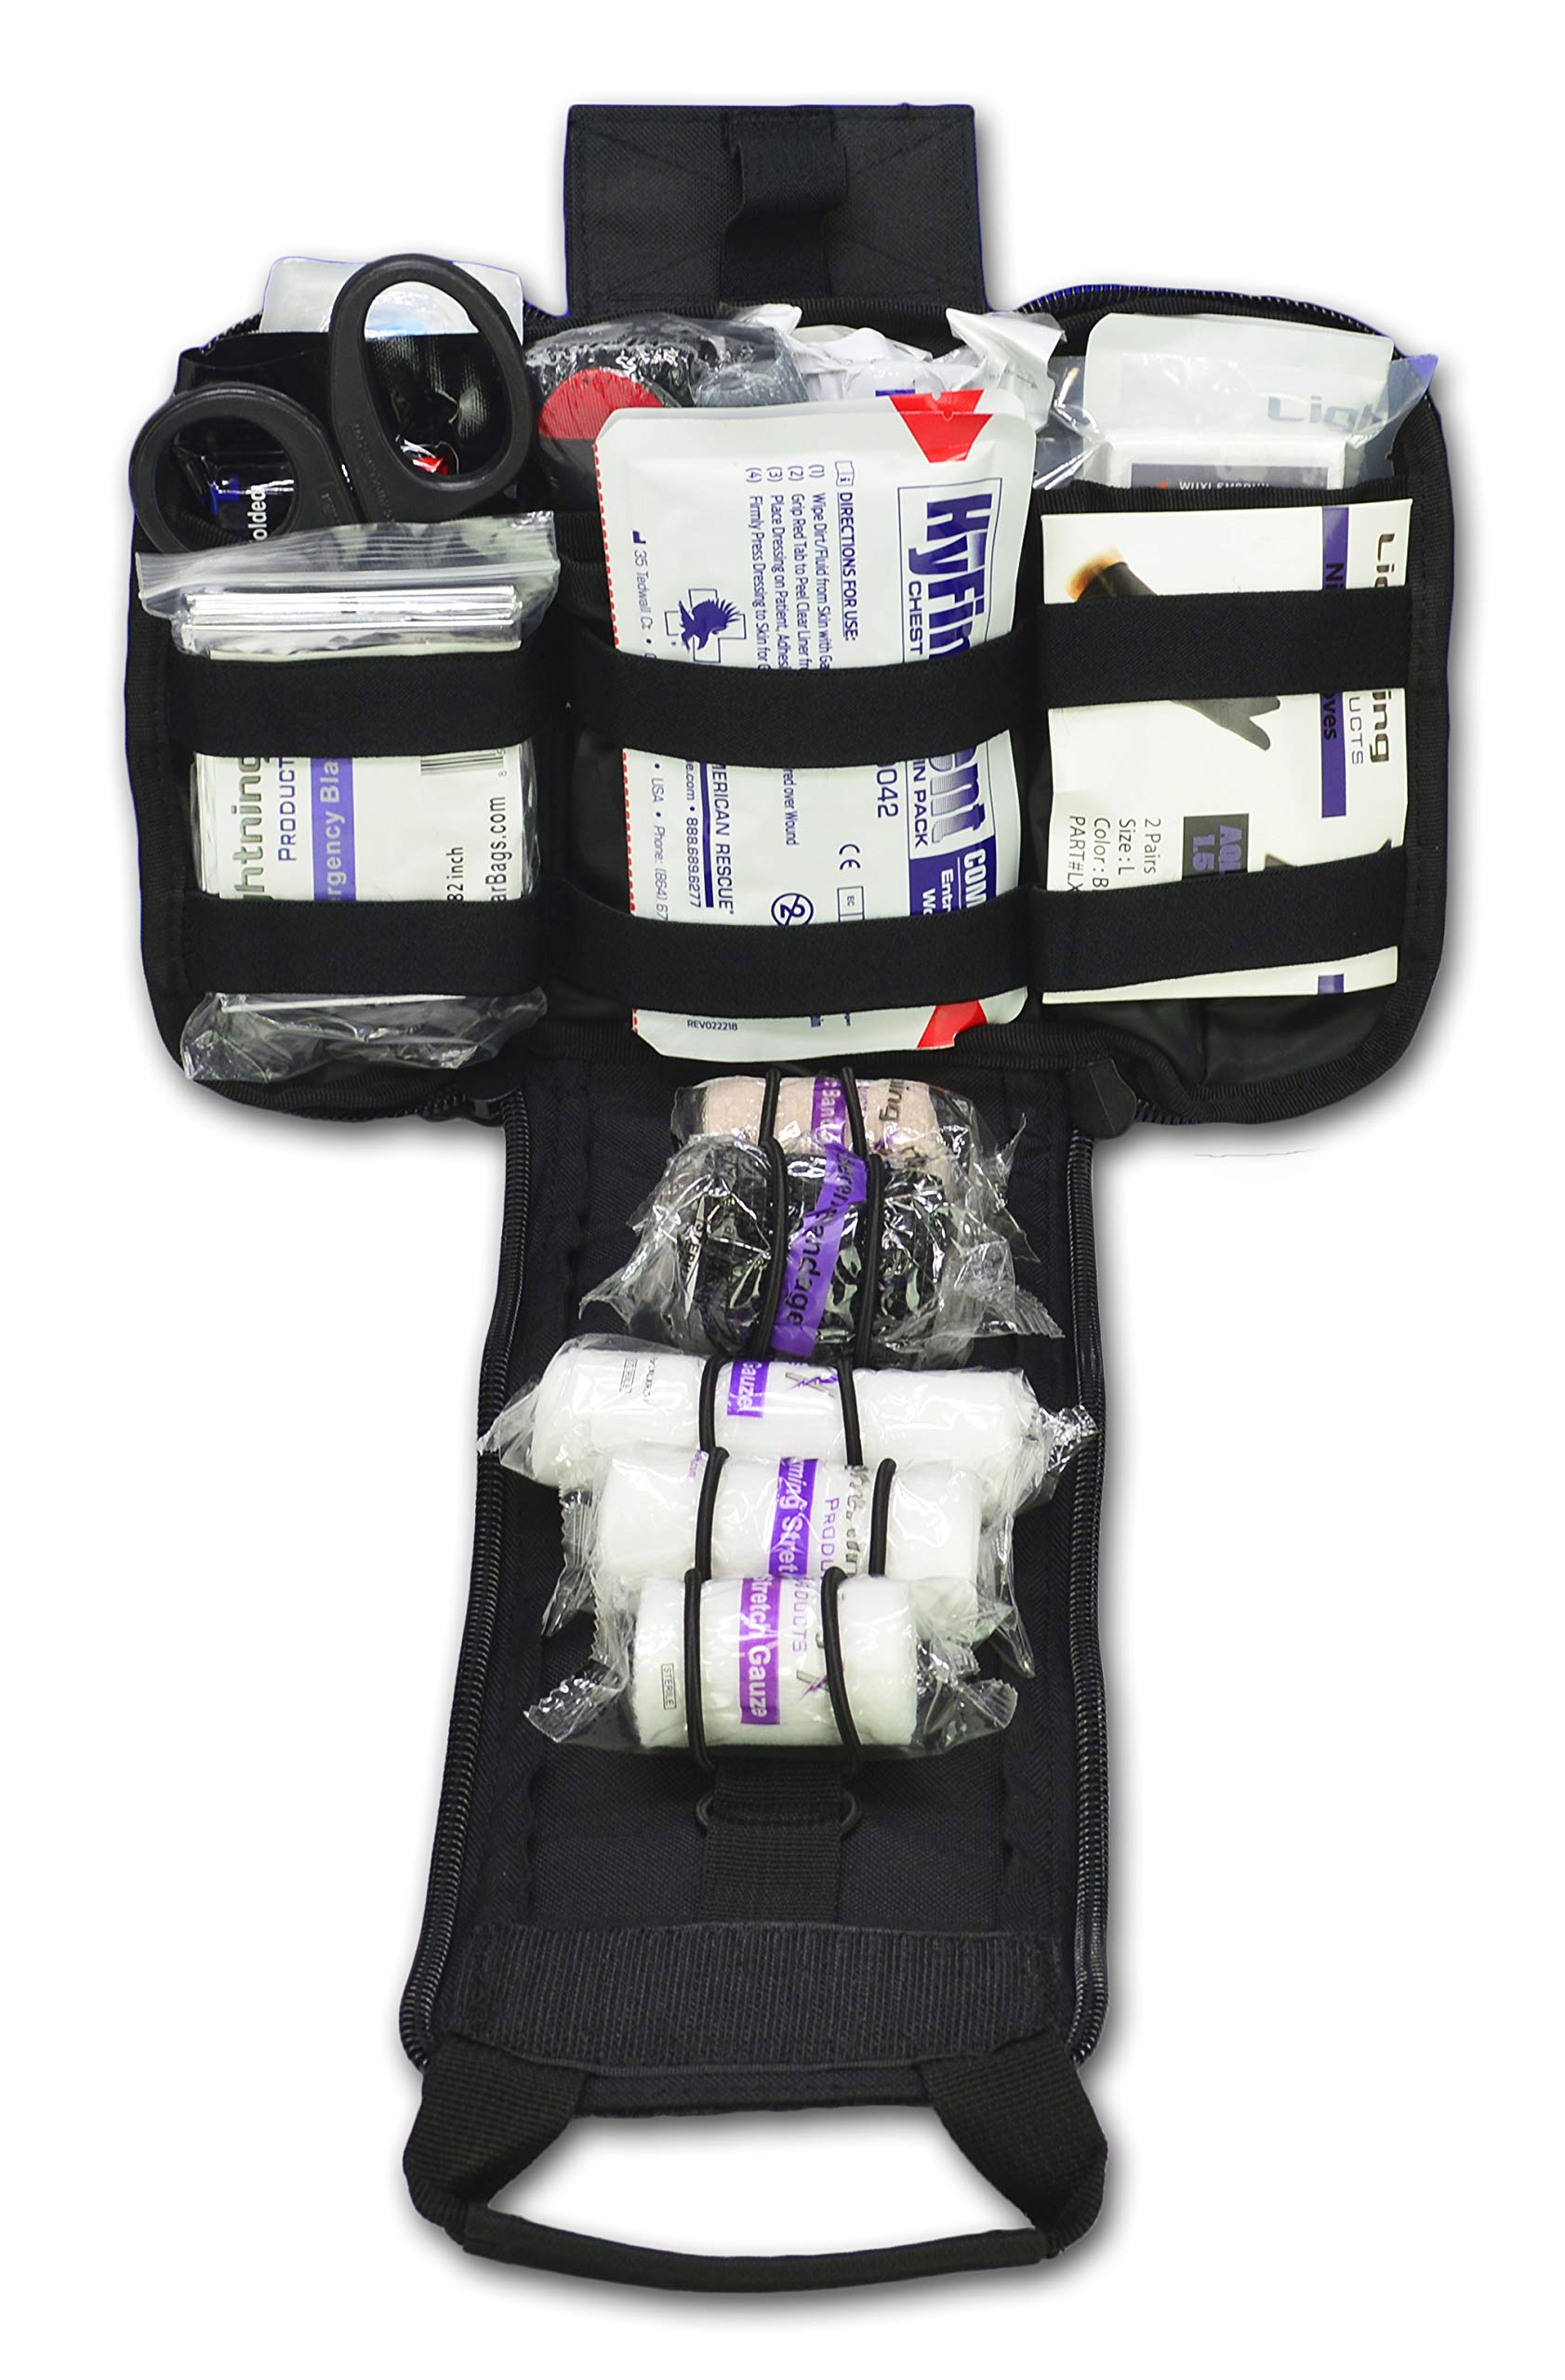 Lightning X Spread Eagle Complete Tactical Gunshot & Trauma IFAK Kit w/Laser Cut MOLLE - Black by Lightning X Products